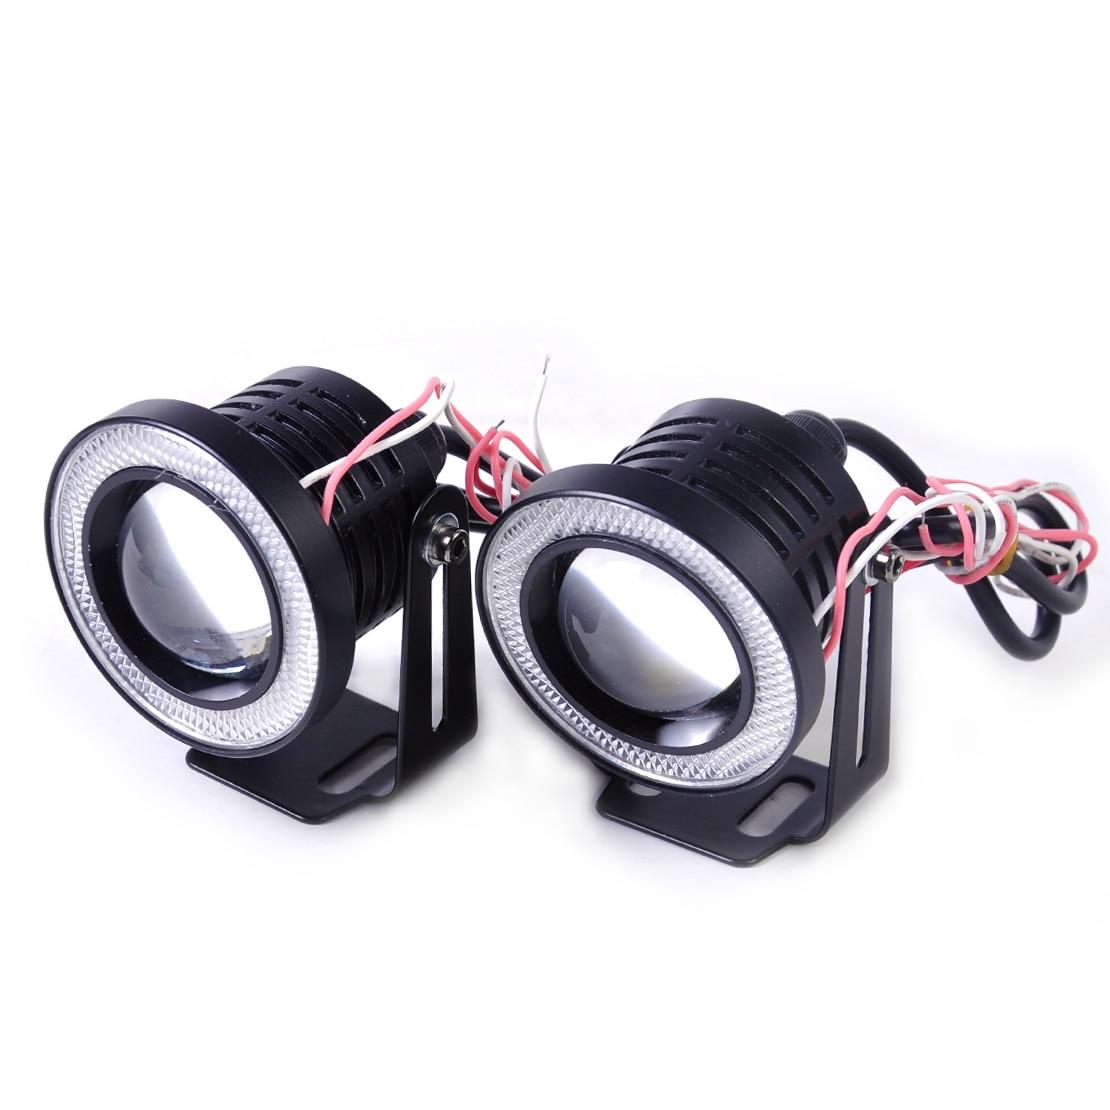 beler Universal 2.5 64mm 10W White LED Projector Fog Lens DRL Driving Light w/ Blue LED Angel Eye Halo Ring For Ford VW Audi VW<br>